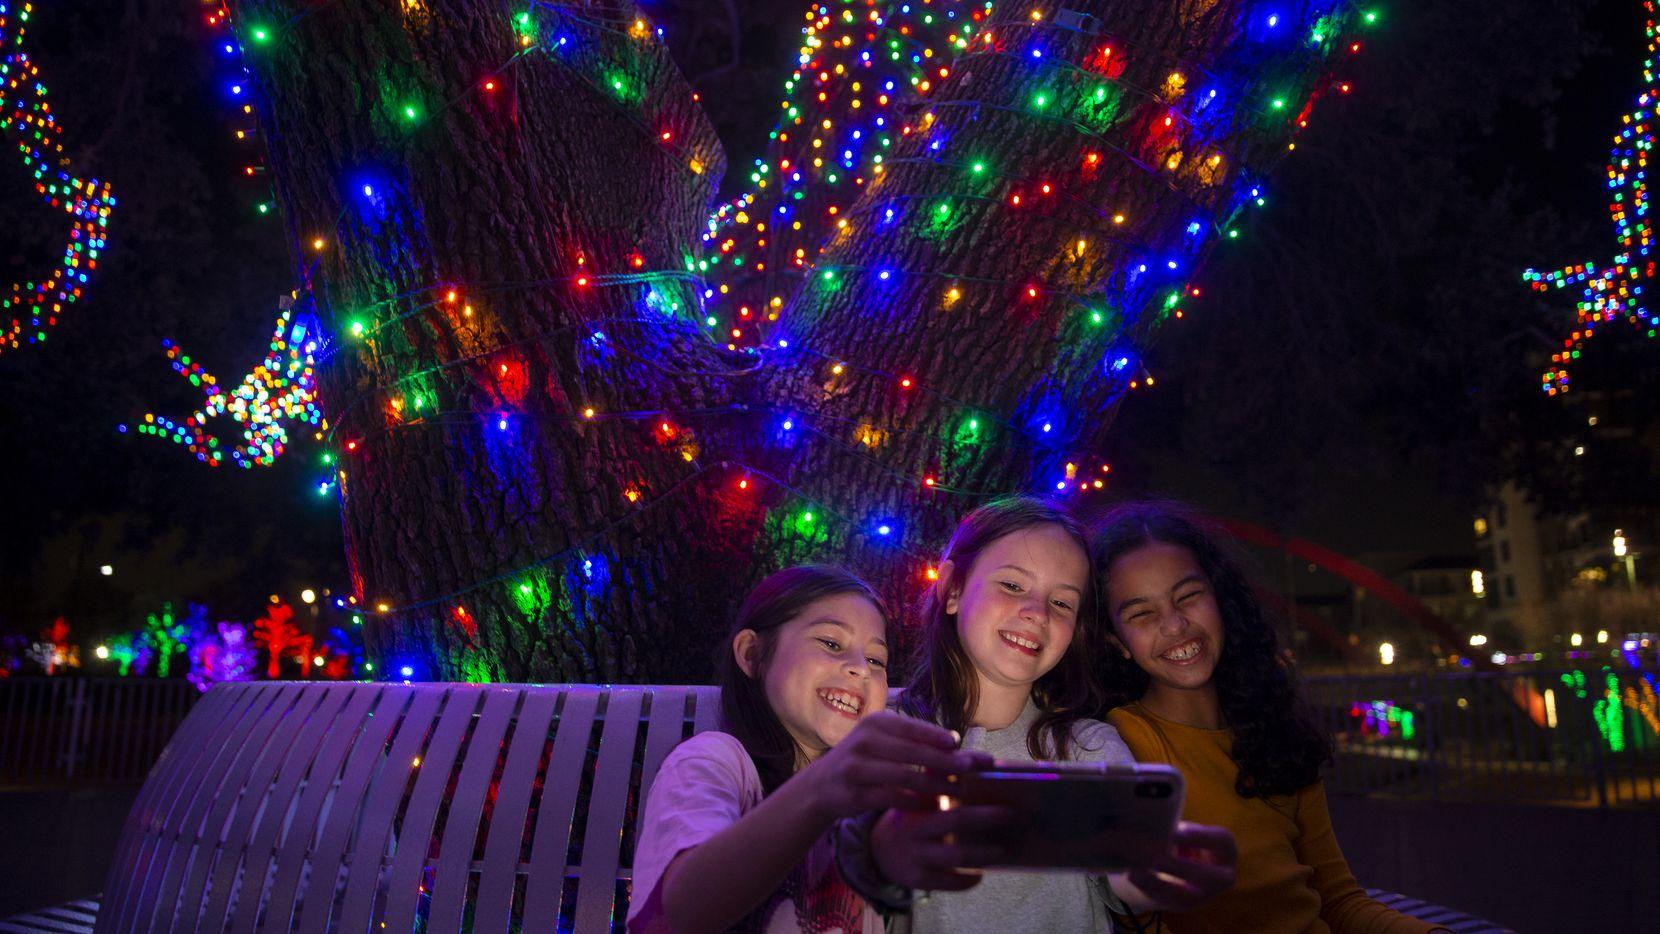 Friends take a selfie at Vitruvian Lights at Vitruvian Park.